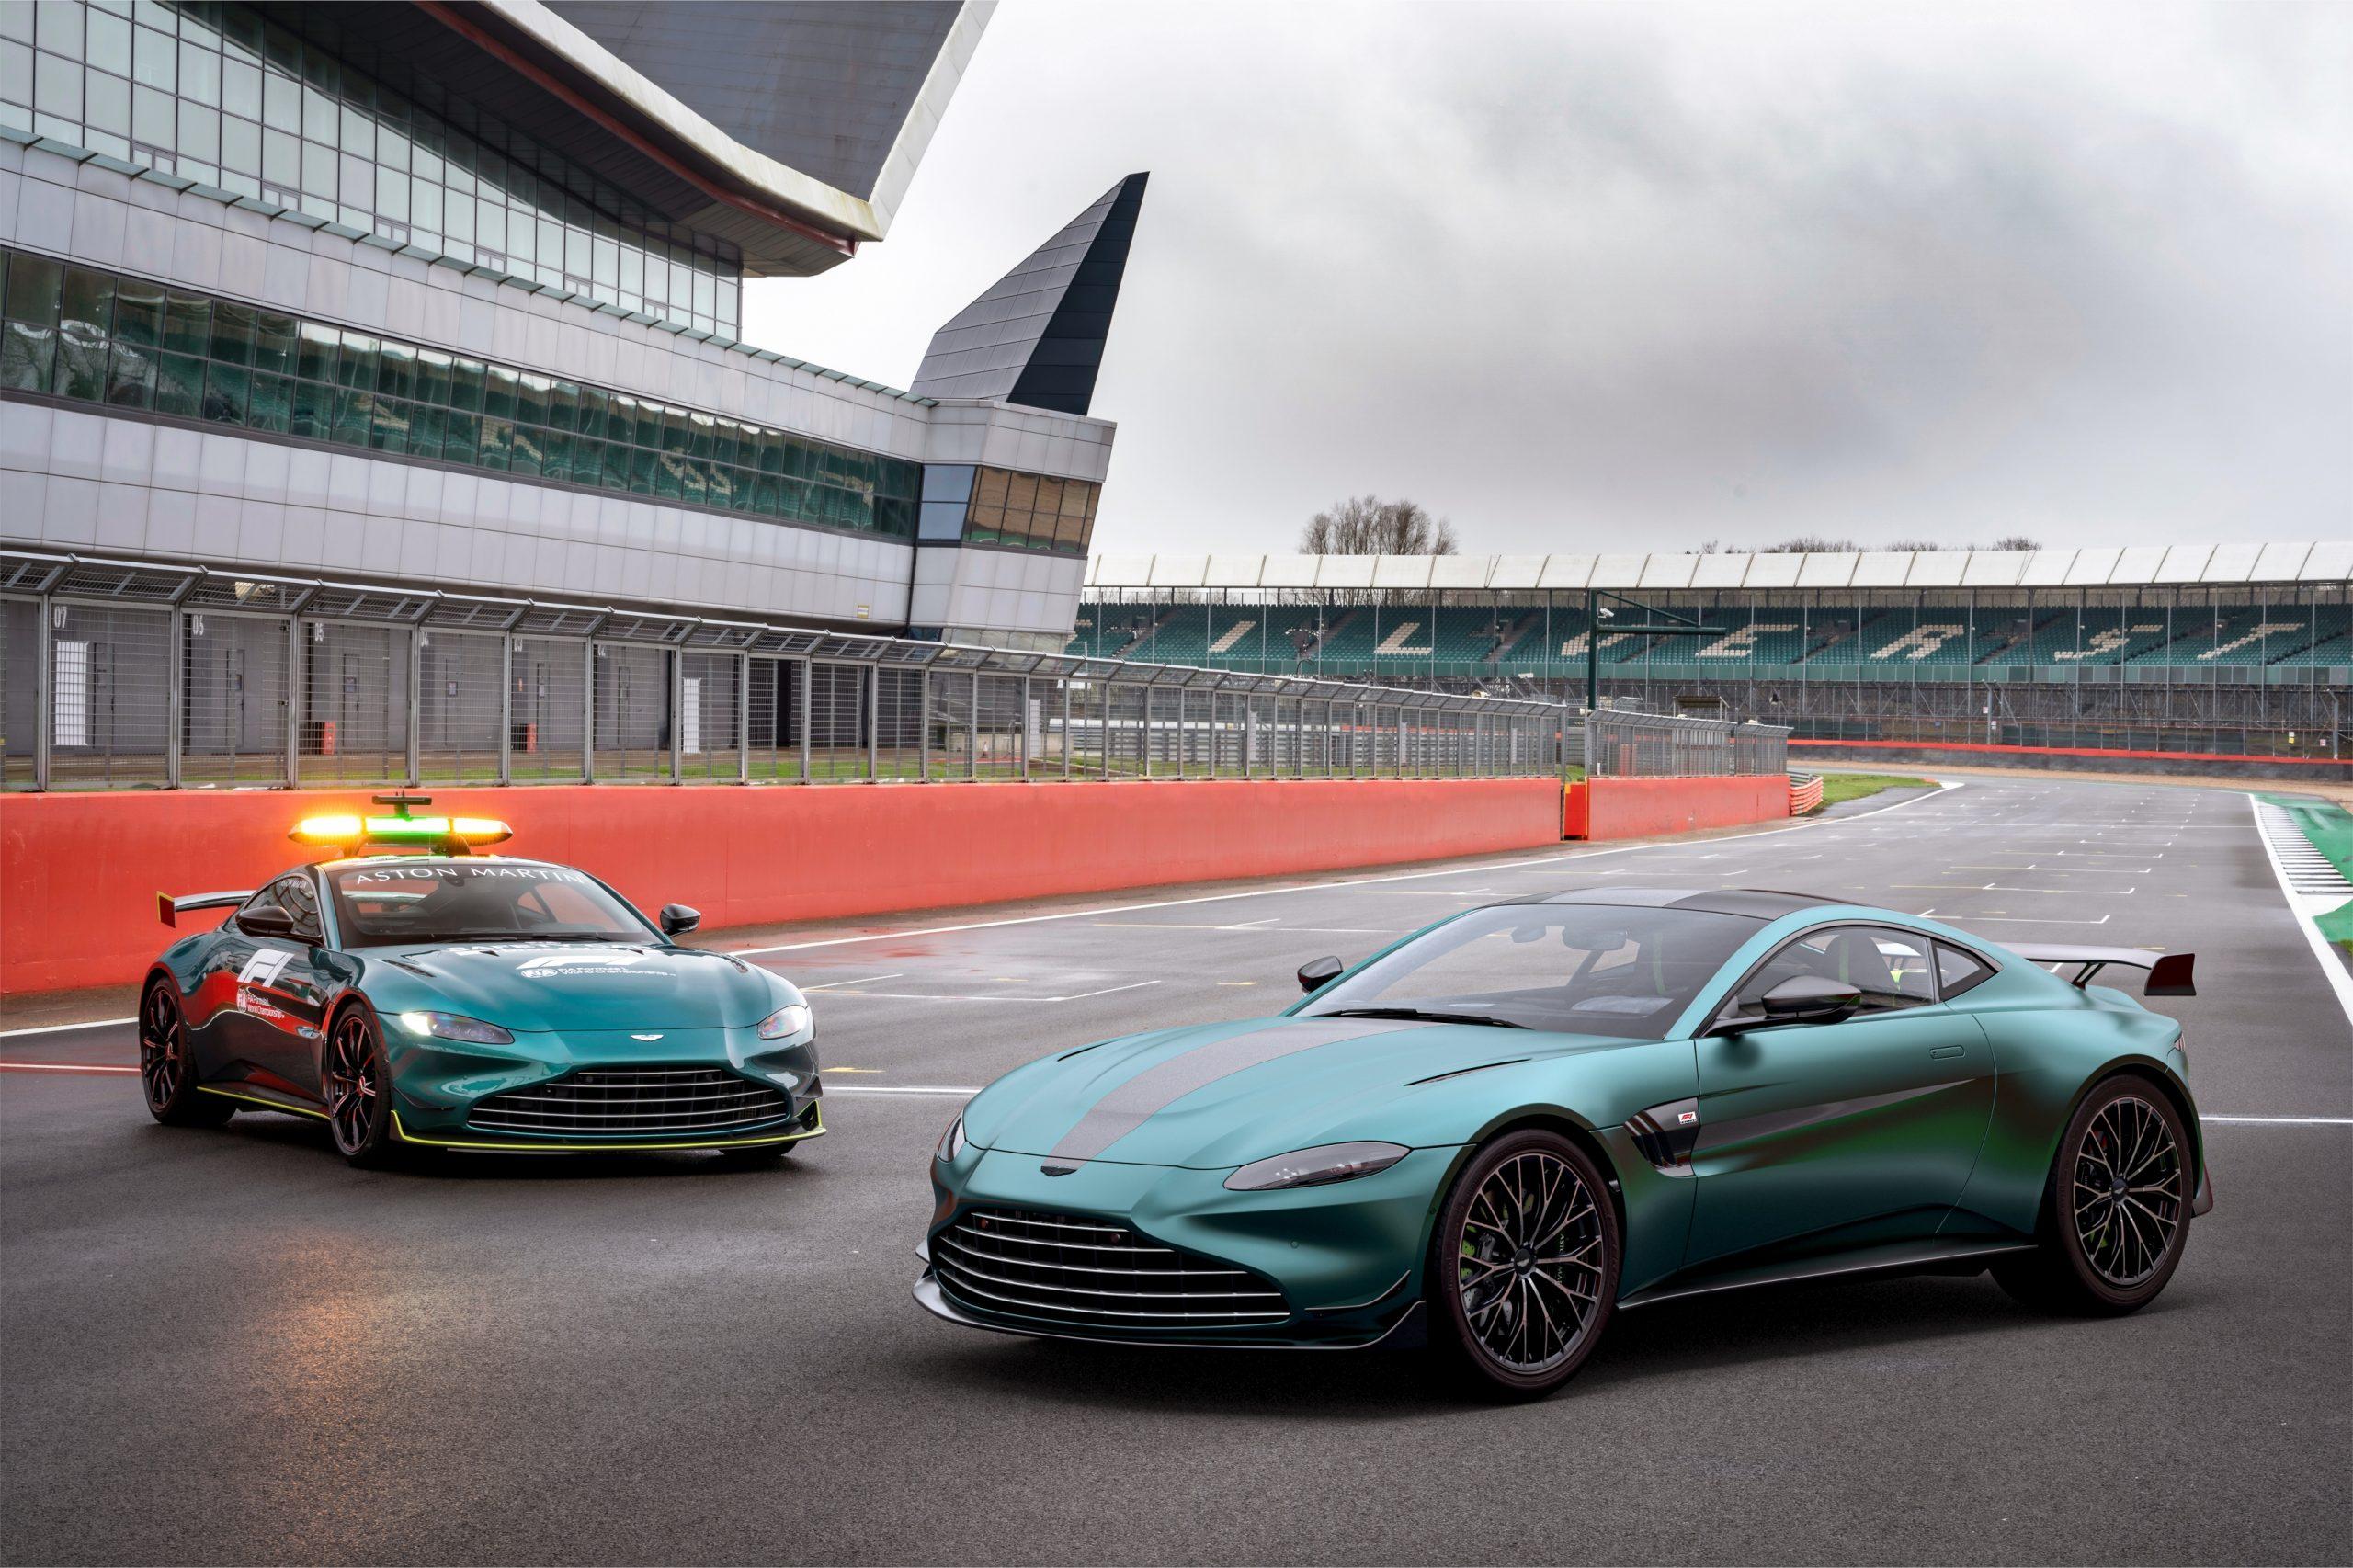 El VantageF1 de Aston Martin